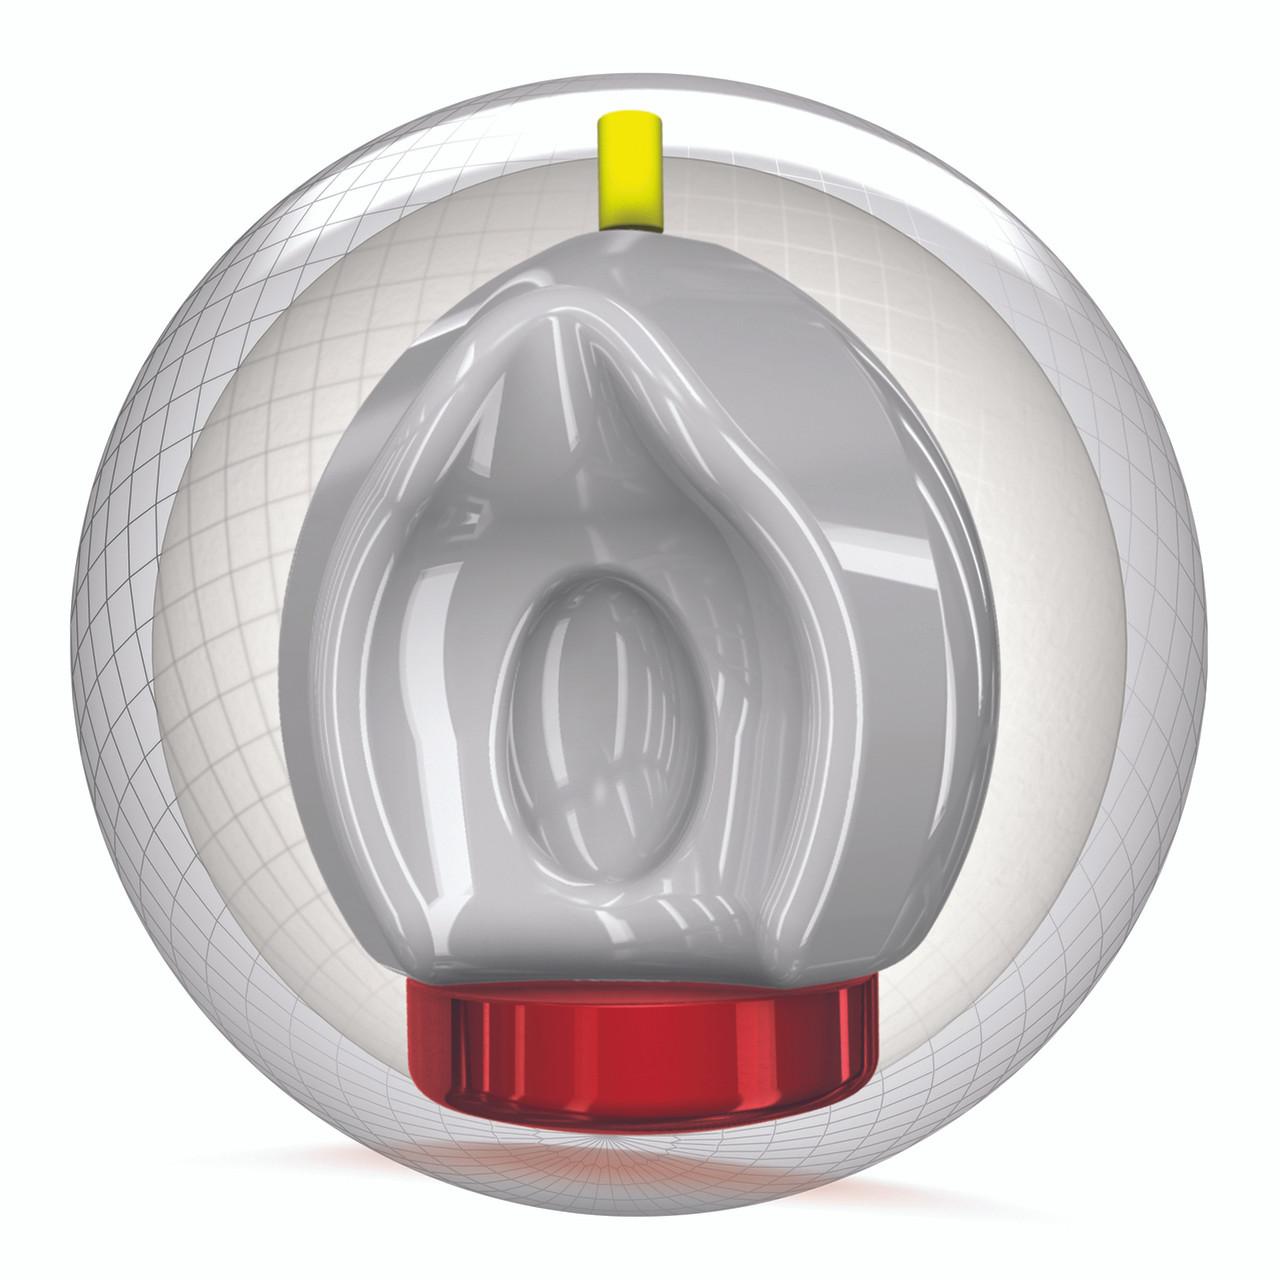 8e93068cb11 Storm Crux Prime Bowling Ball FREE SHIPPING - BuddiesProShop.com